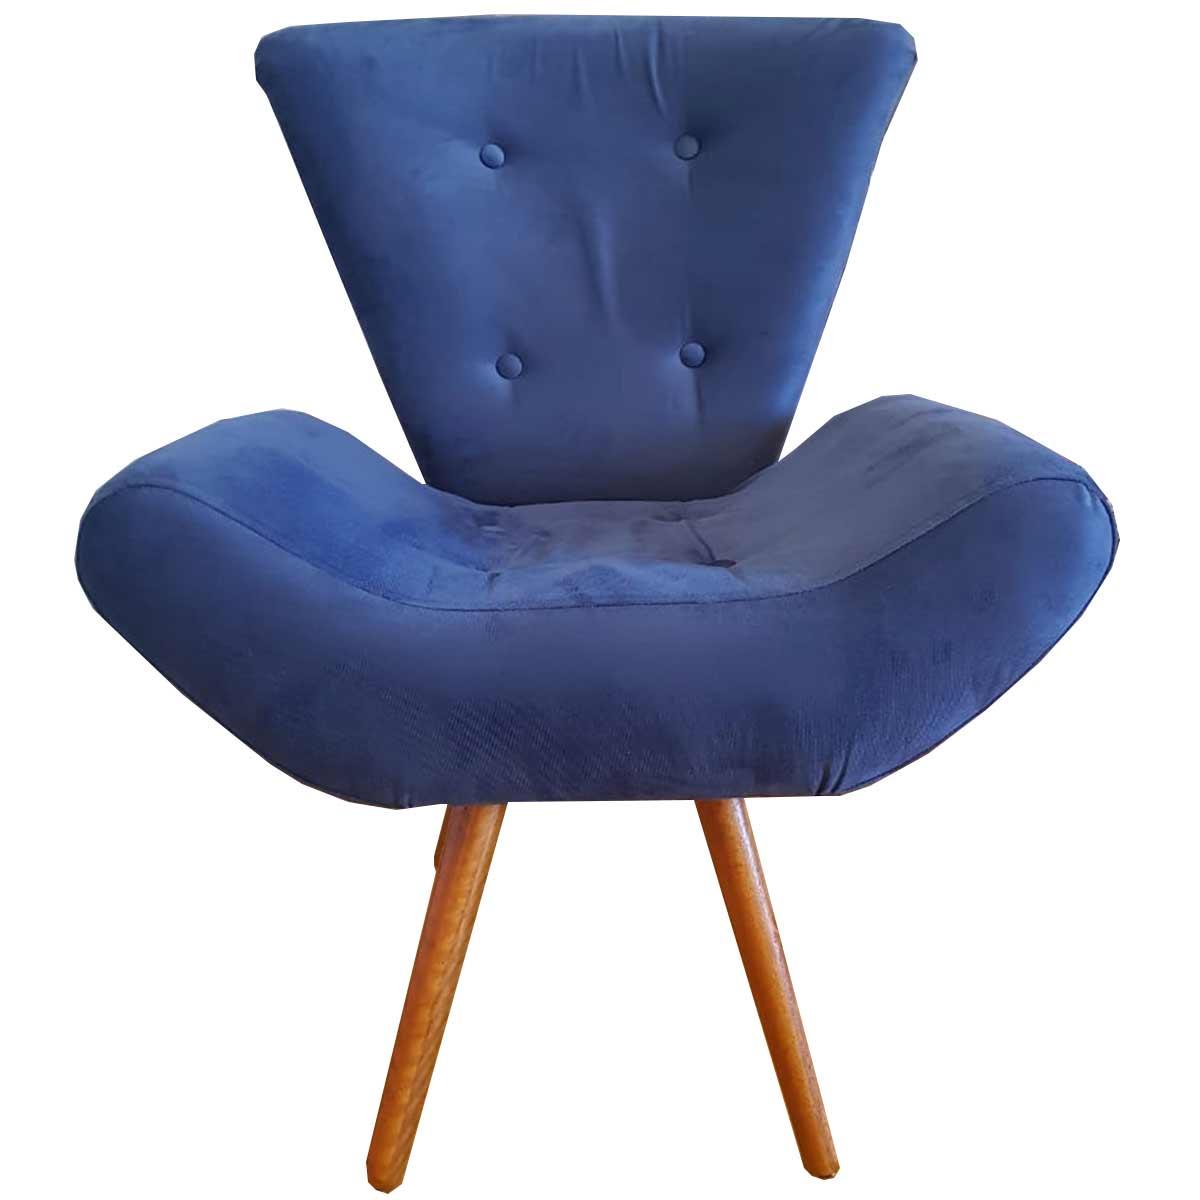 Poltrona Decorativa Diana Pé Palito Animale Azul Marinho